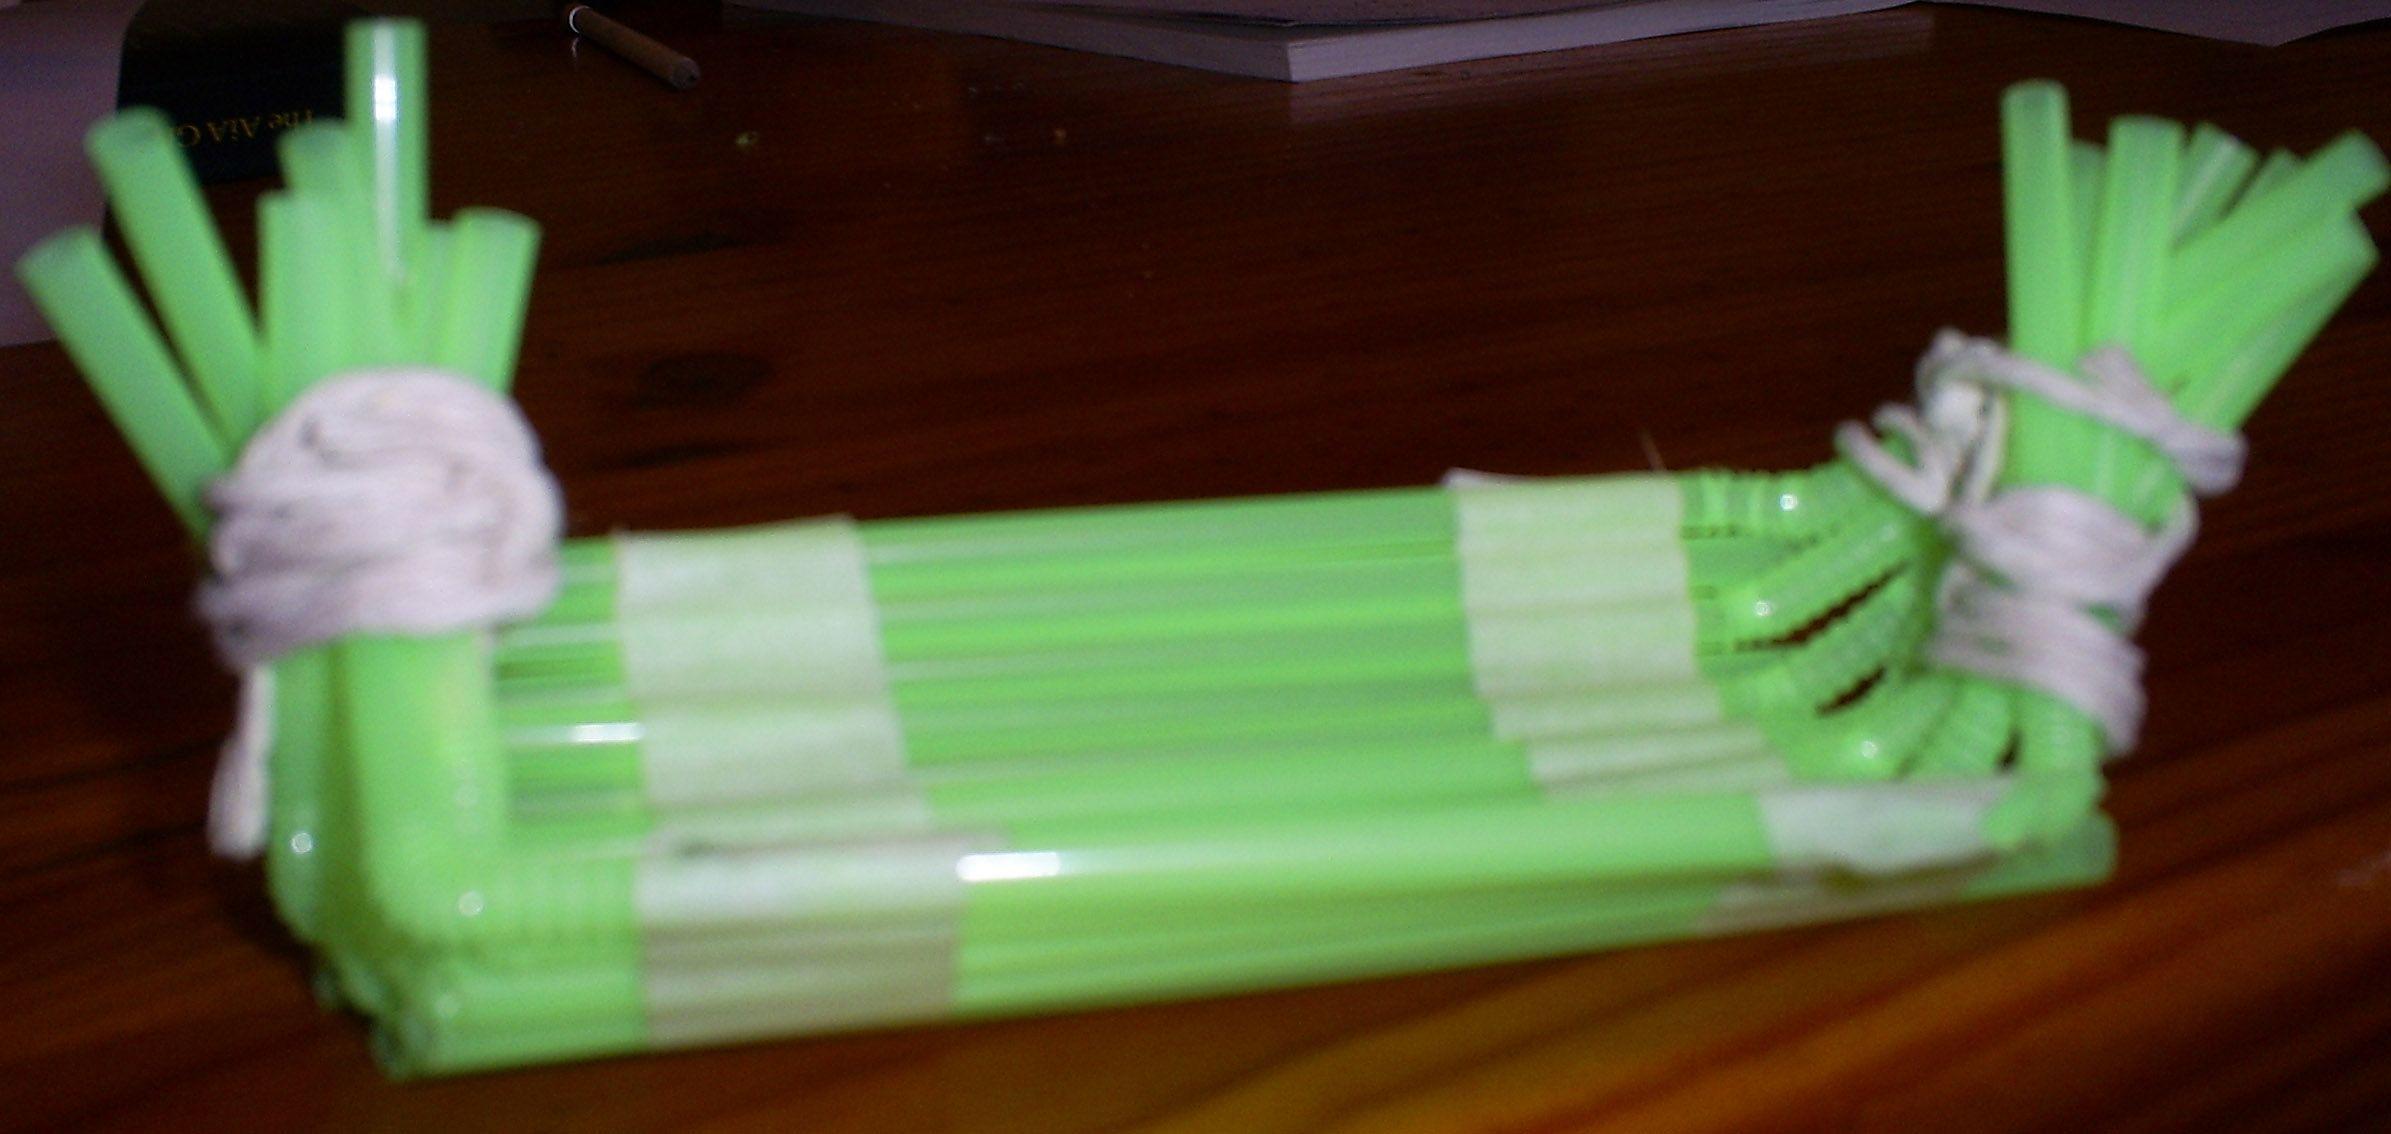 how to make chopsticks out of straws